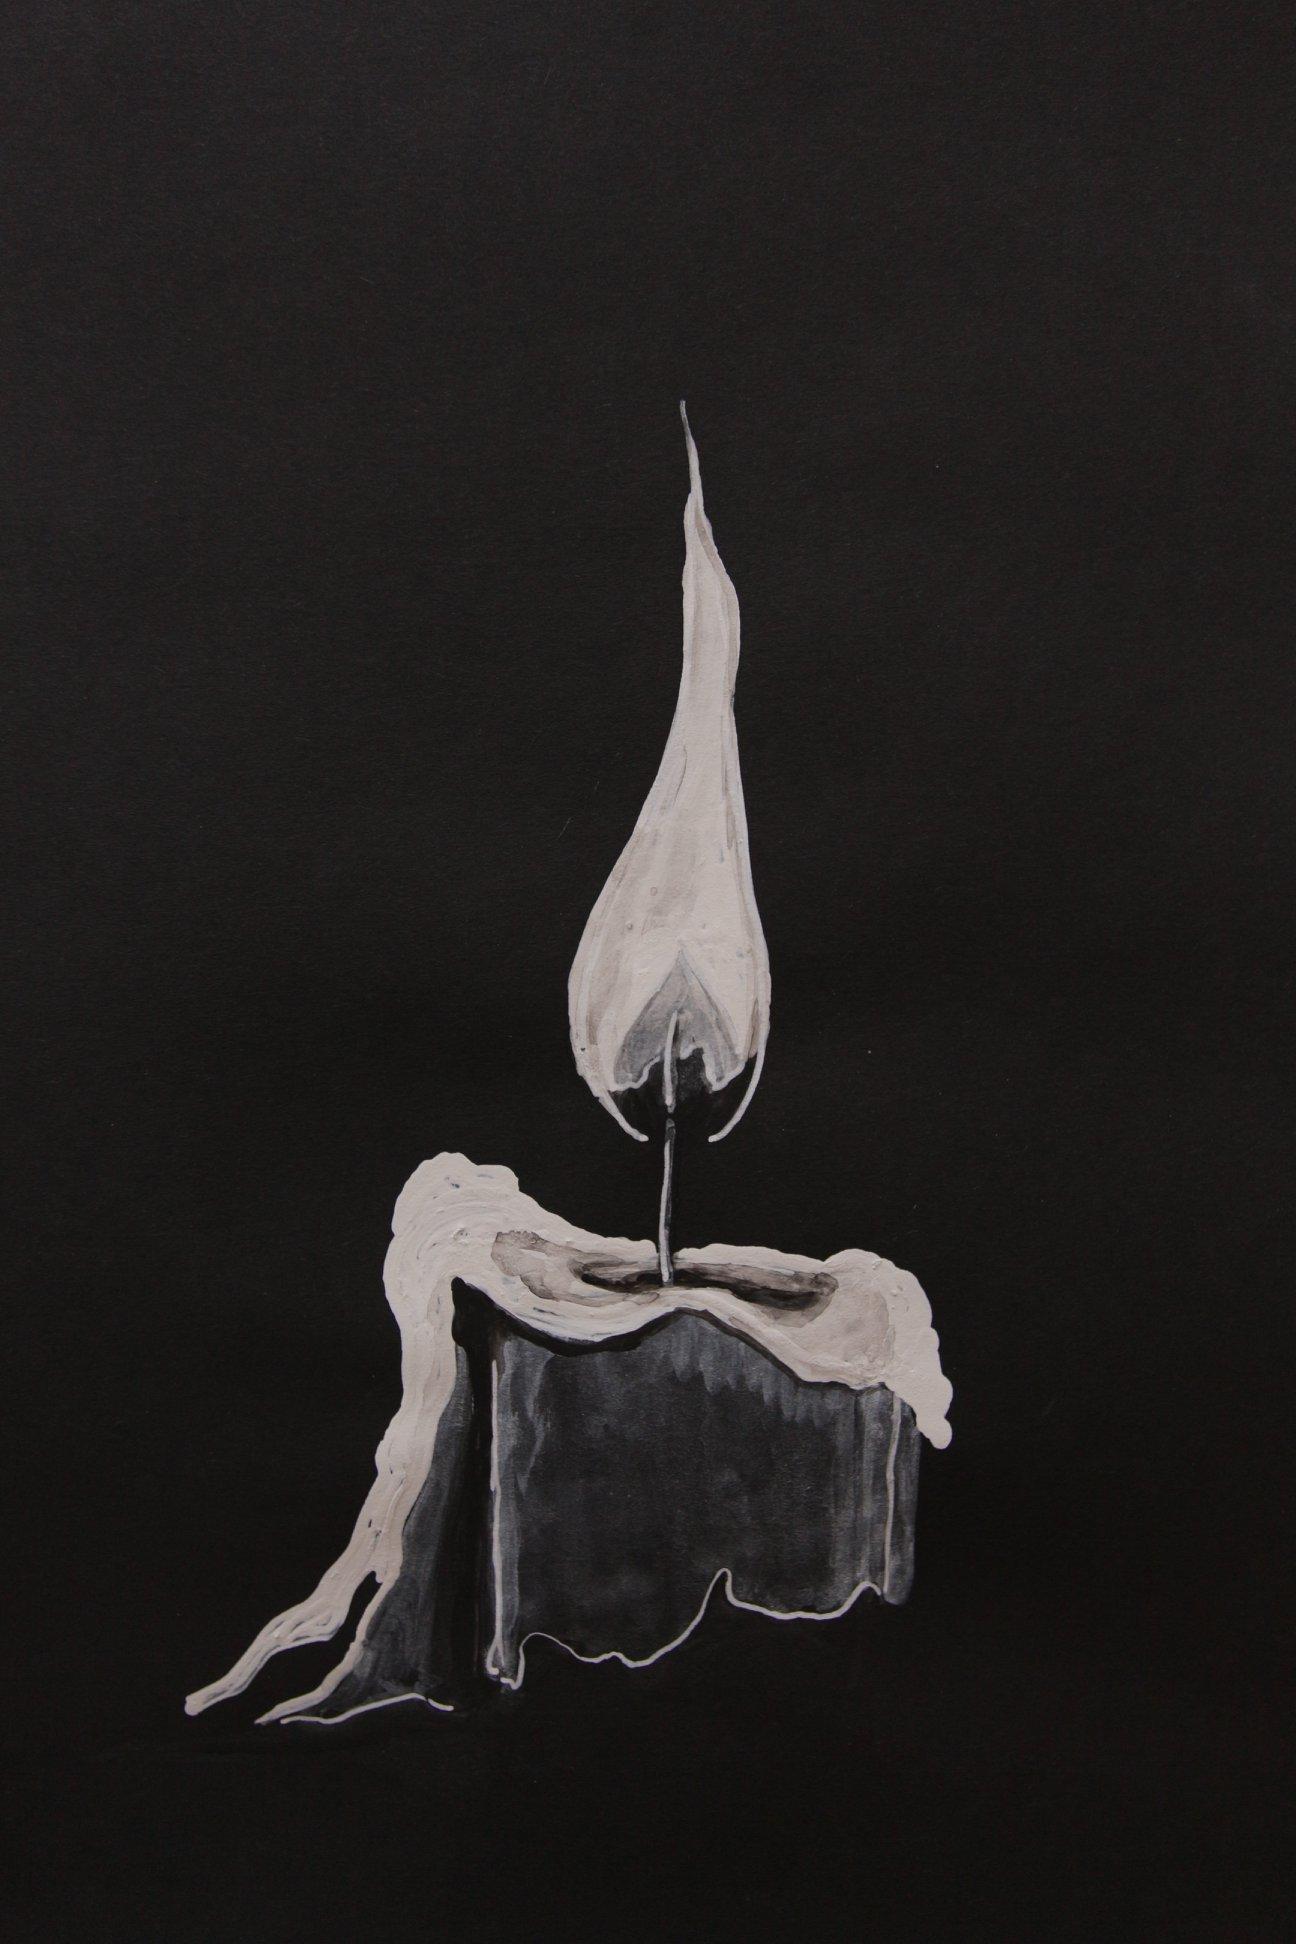 Sènami Donoumassou, 9 bougies, Dessins, 2019.